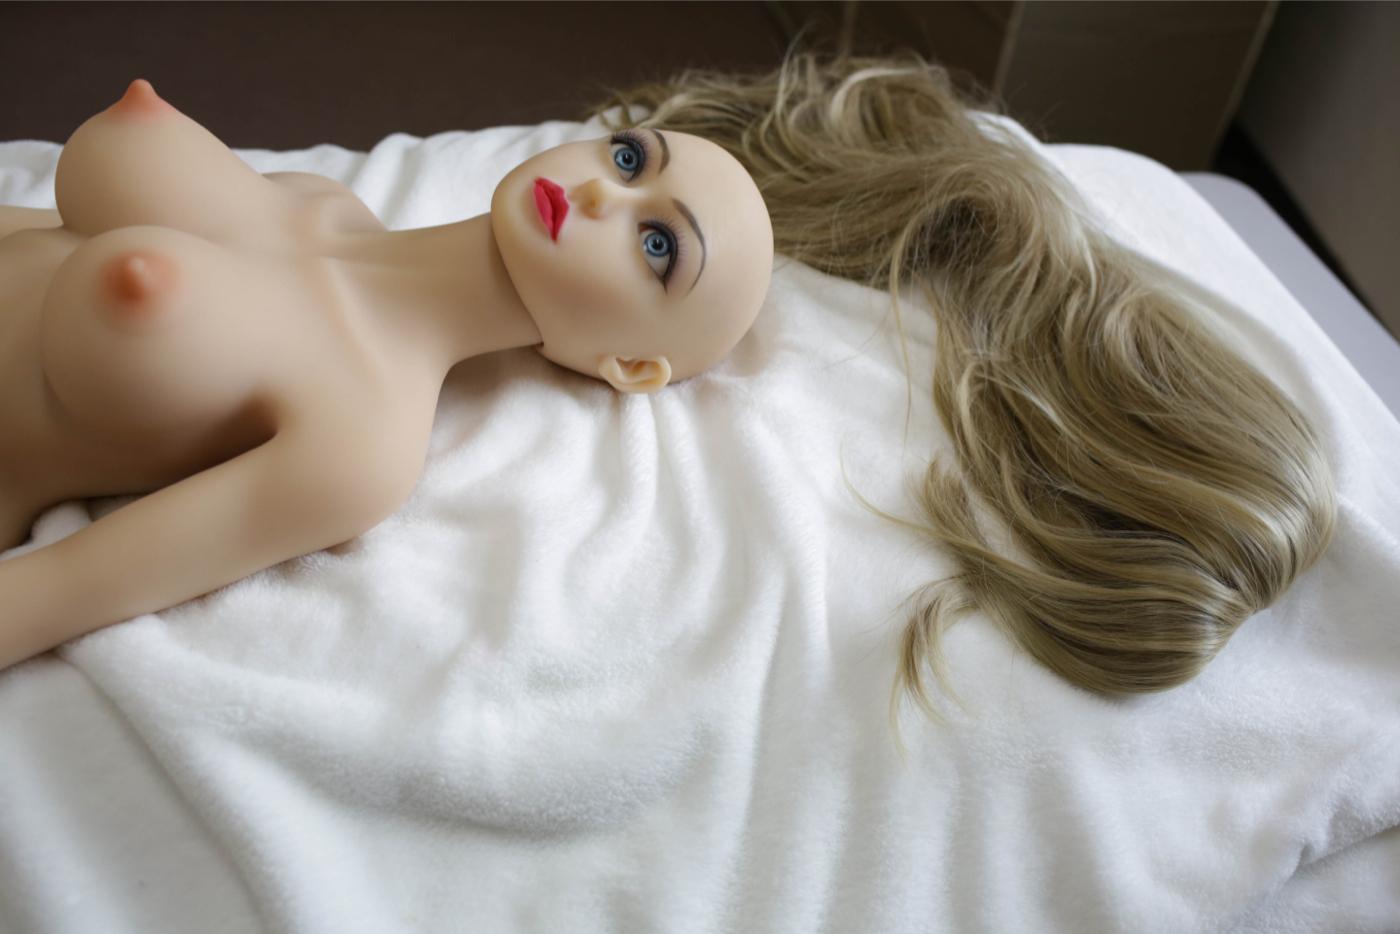 doll-body